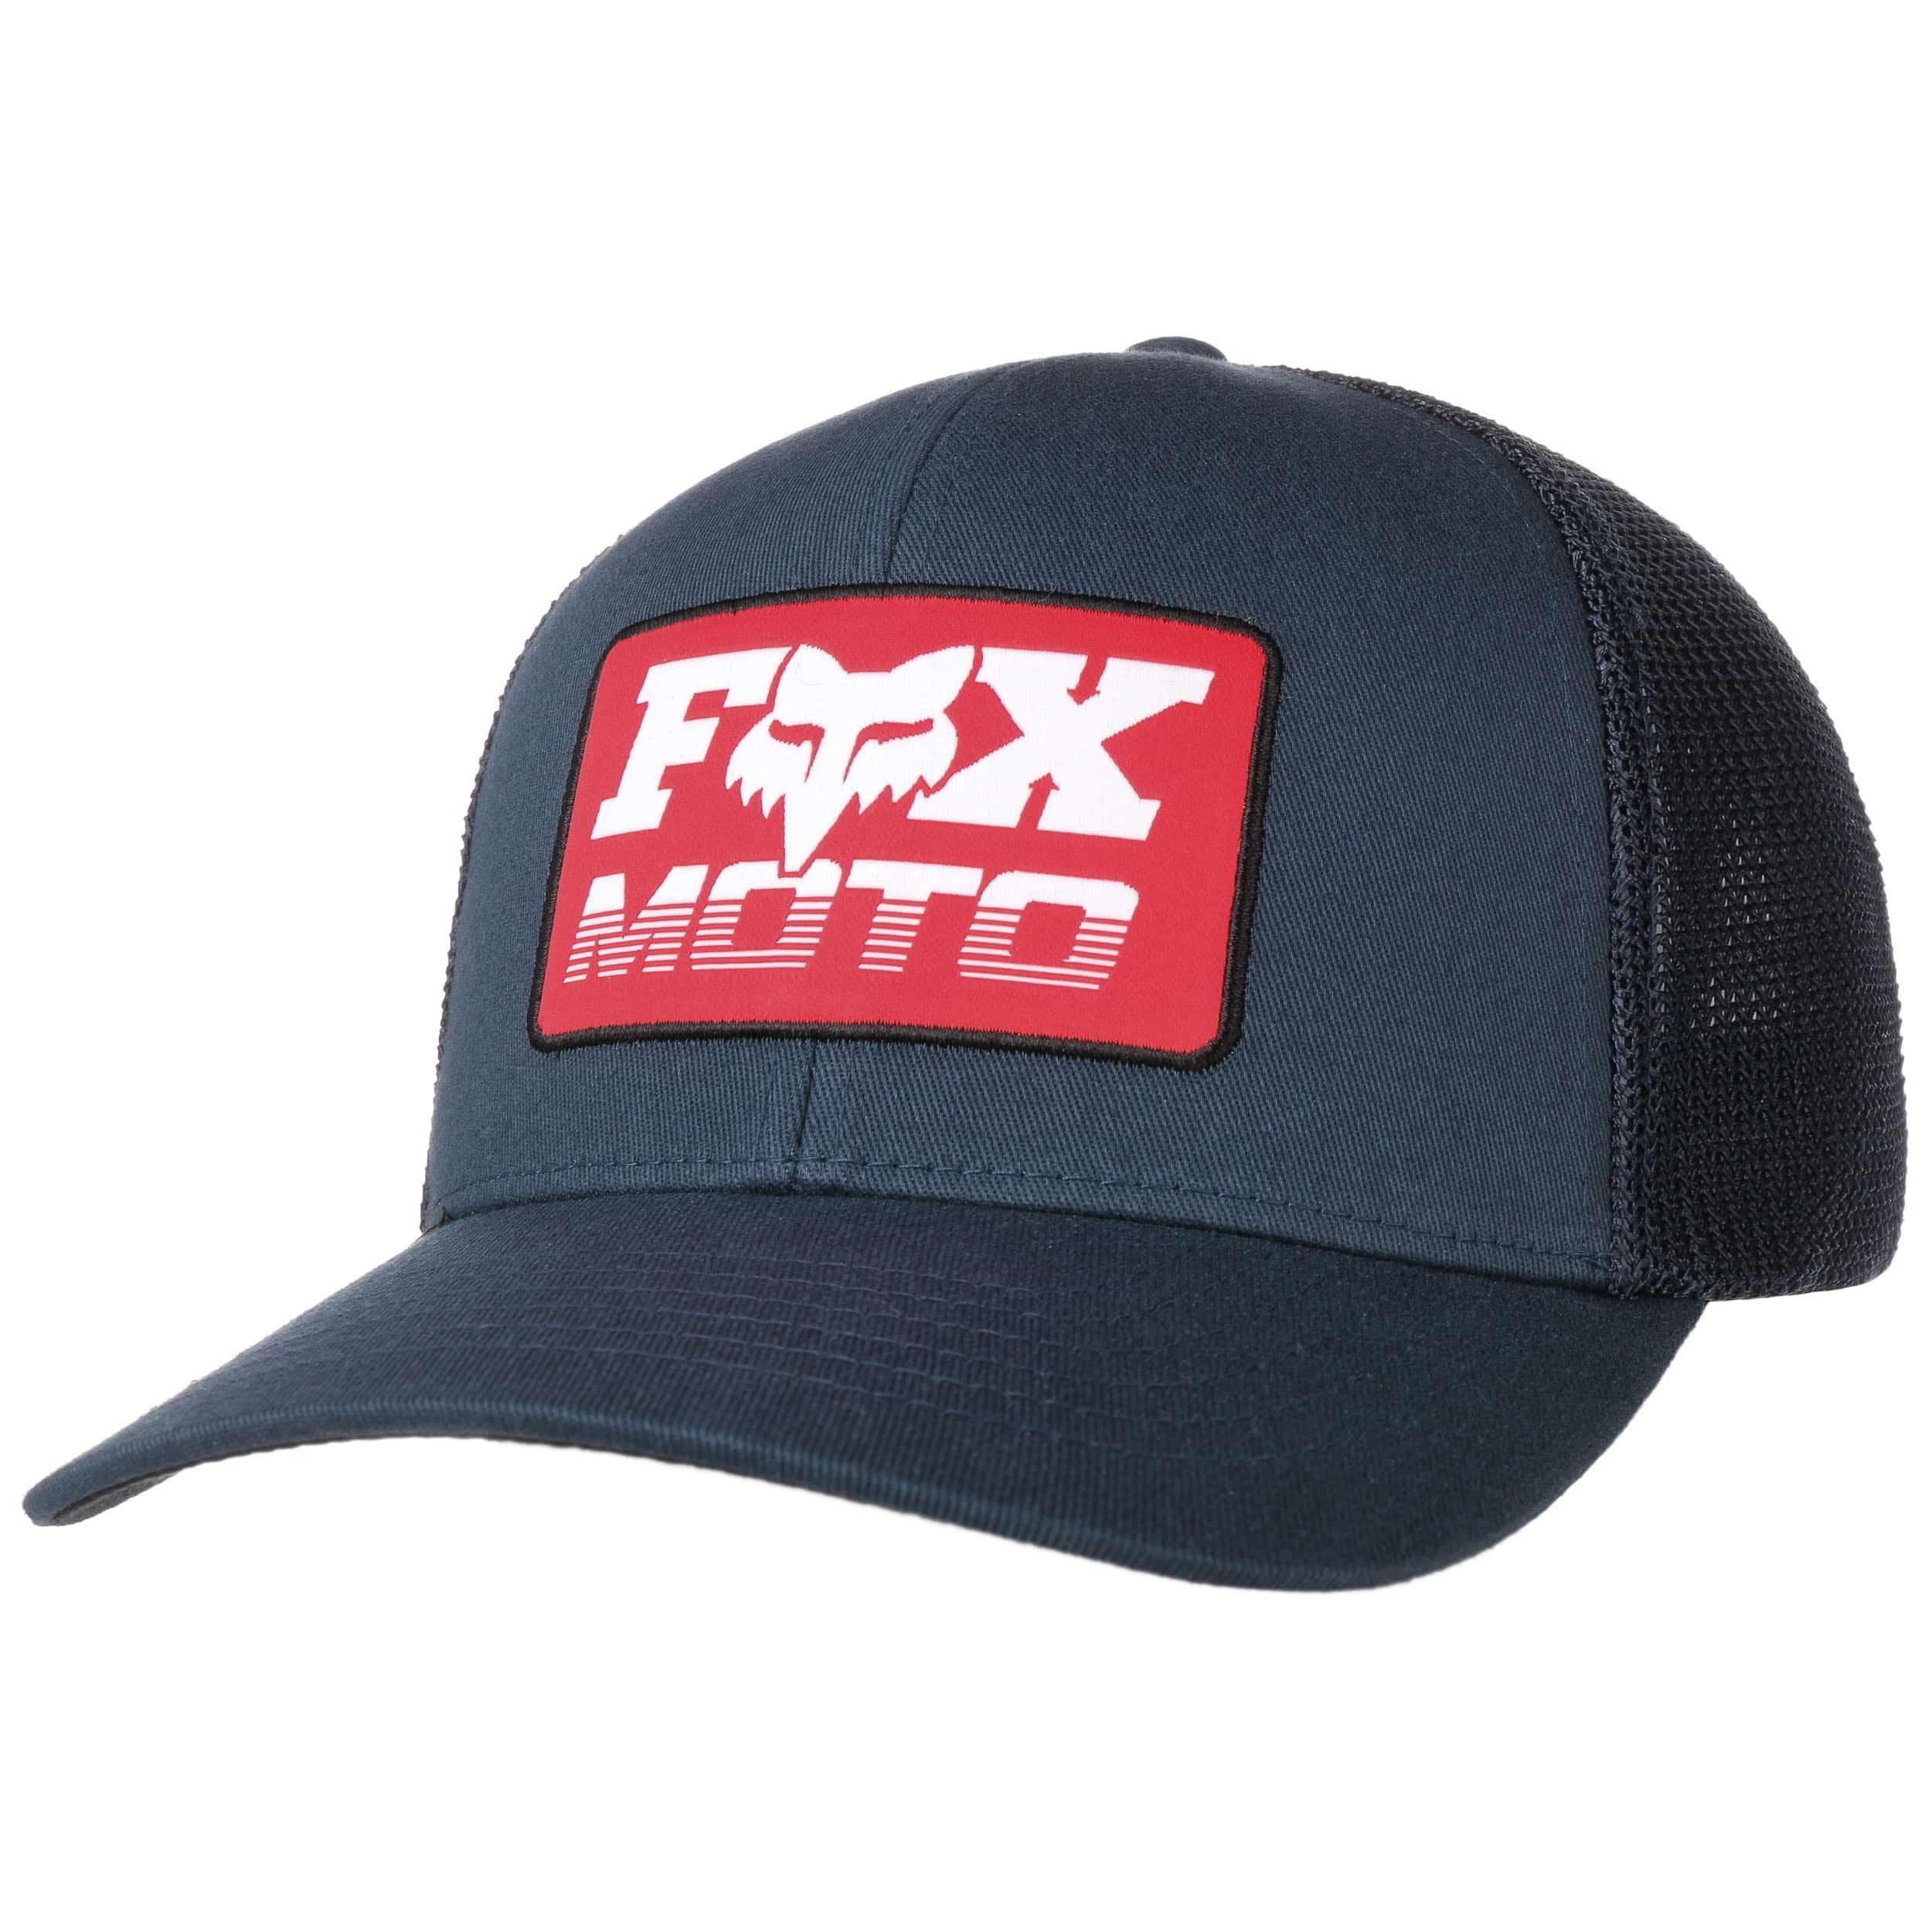 FOX Castr Flexfit Cap Basecap Baseballcap Fullcap Caps Herren